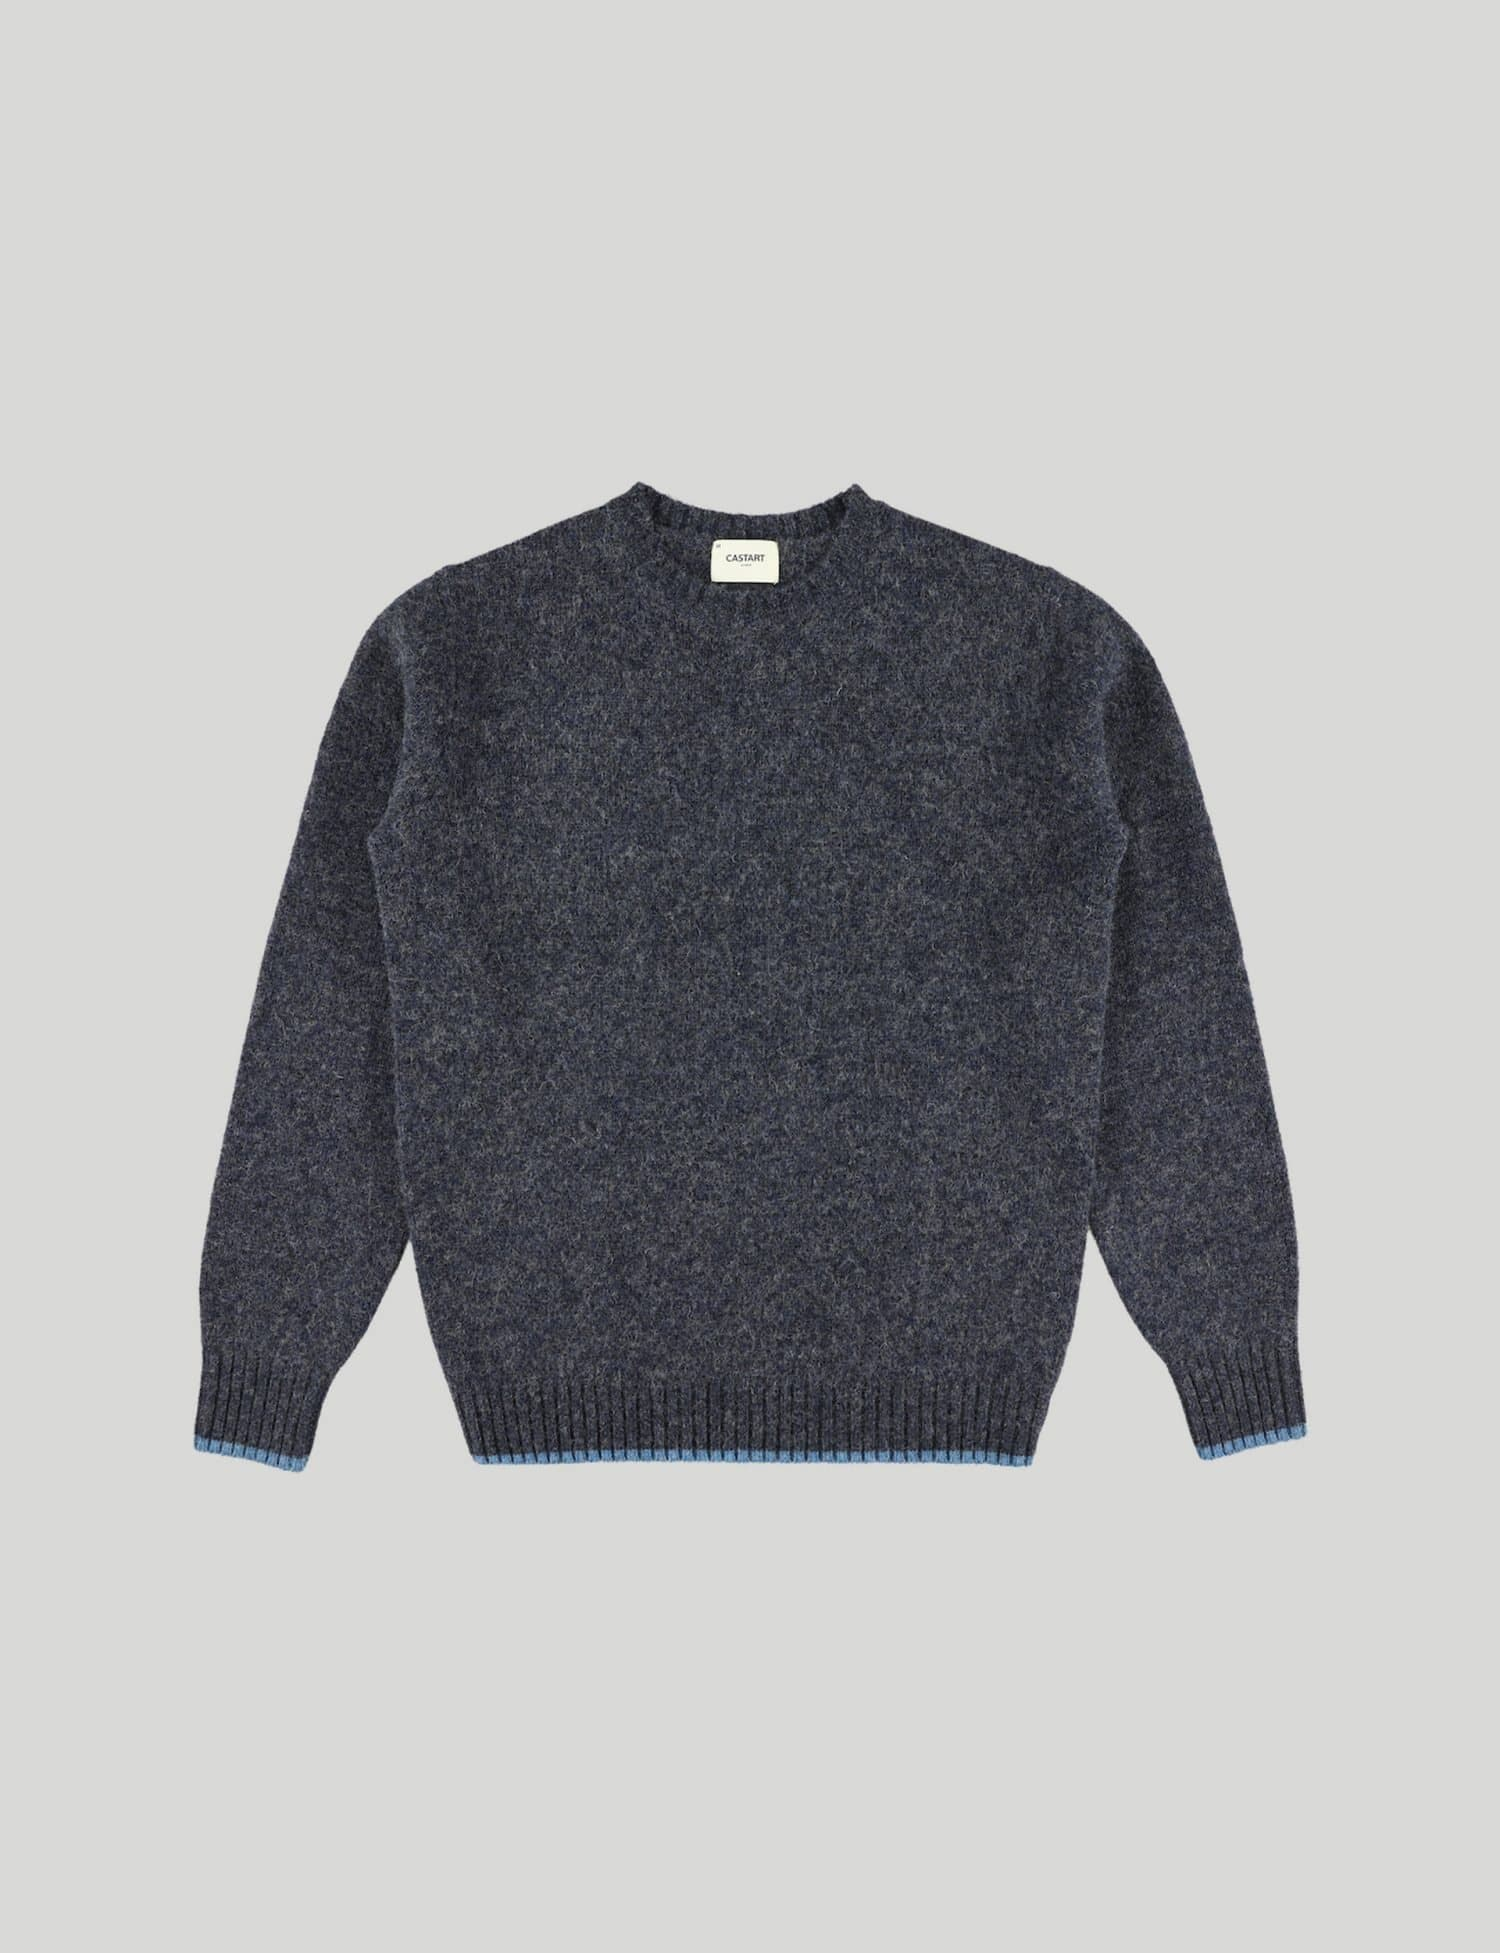 Castart - Kotin Knitwear - Navy